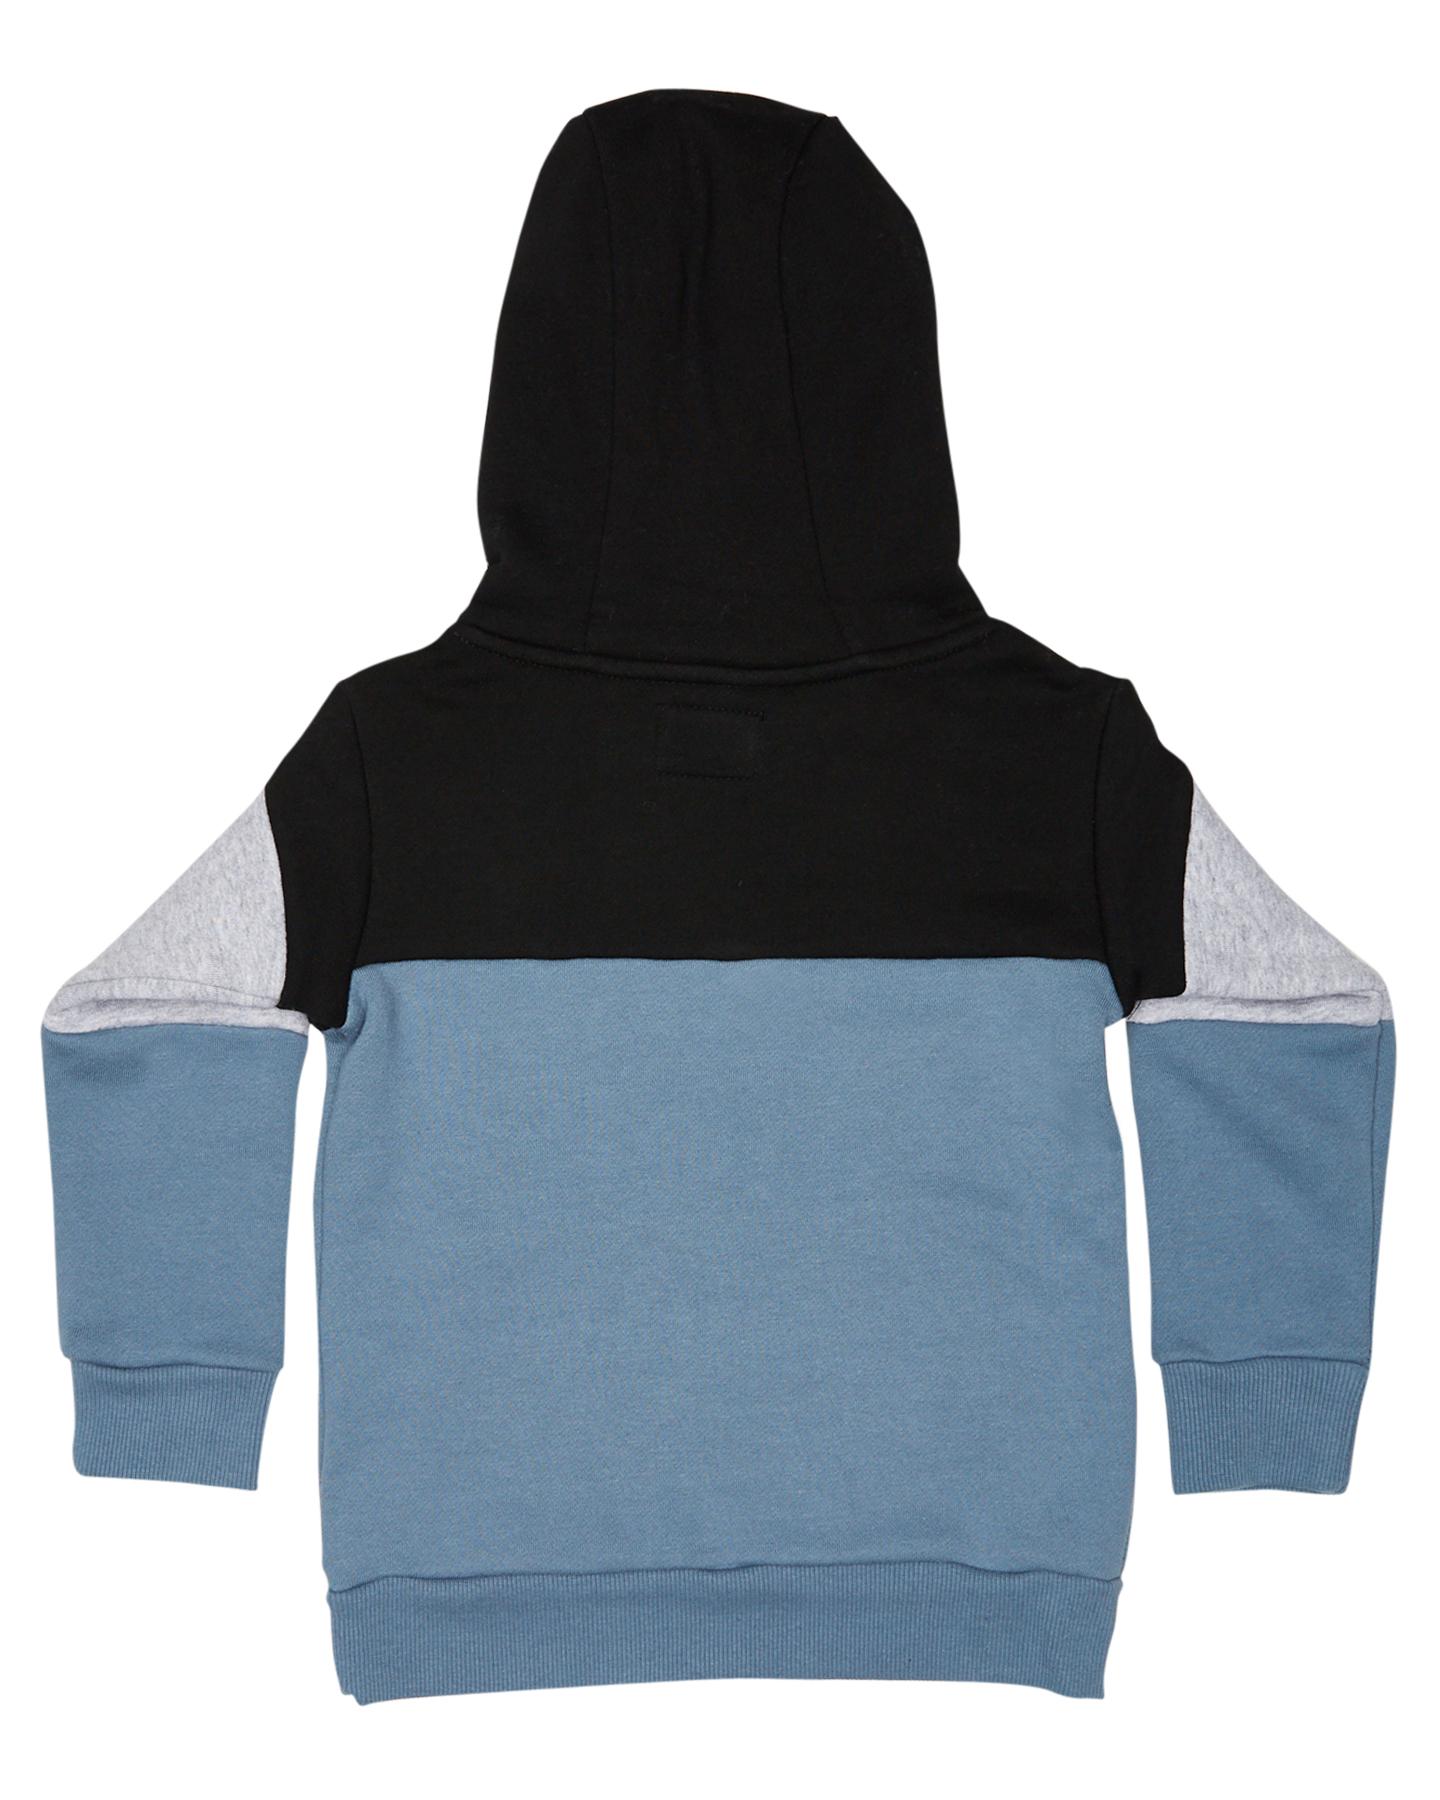 New-St-Goliath-Boys-Boys-Transit-Hoody-Kids-Cotton-Soft-Blue thumbnail 6